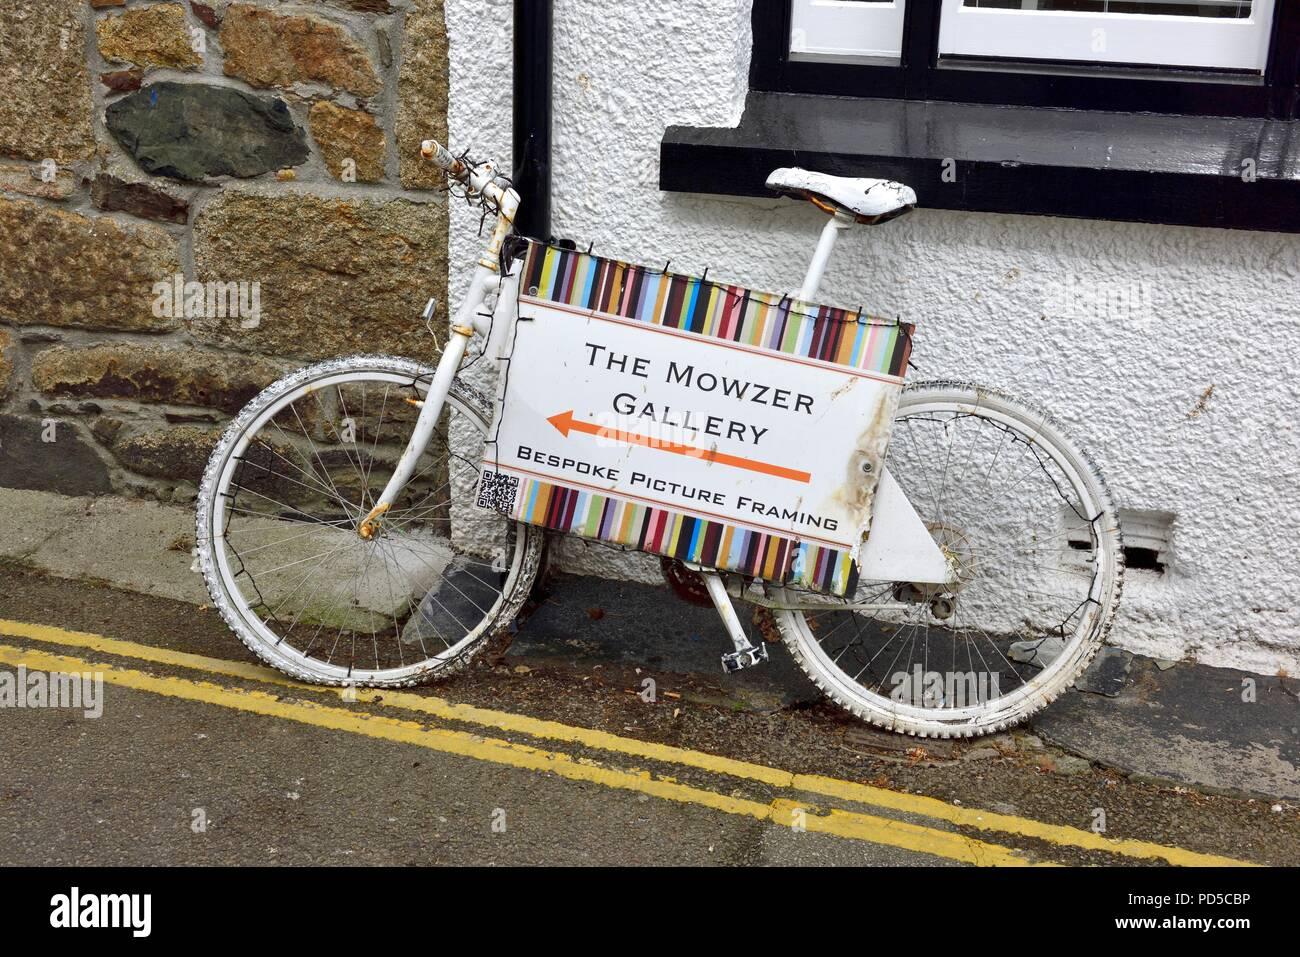 Weiß lackiert Fahrrad Werbung eine Galerie. Fowey, Cornwall, England ...